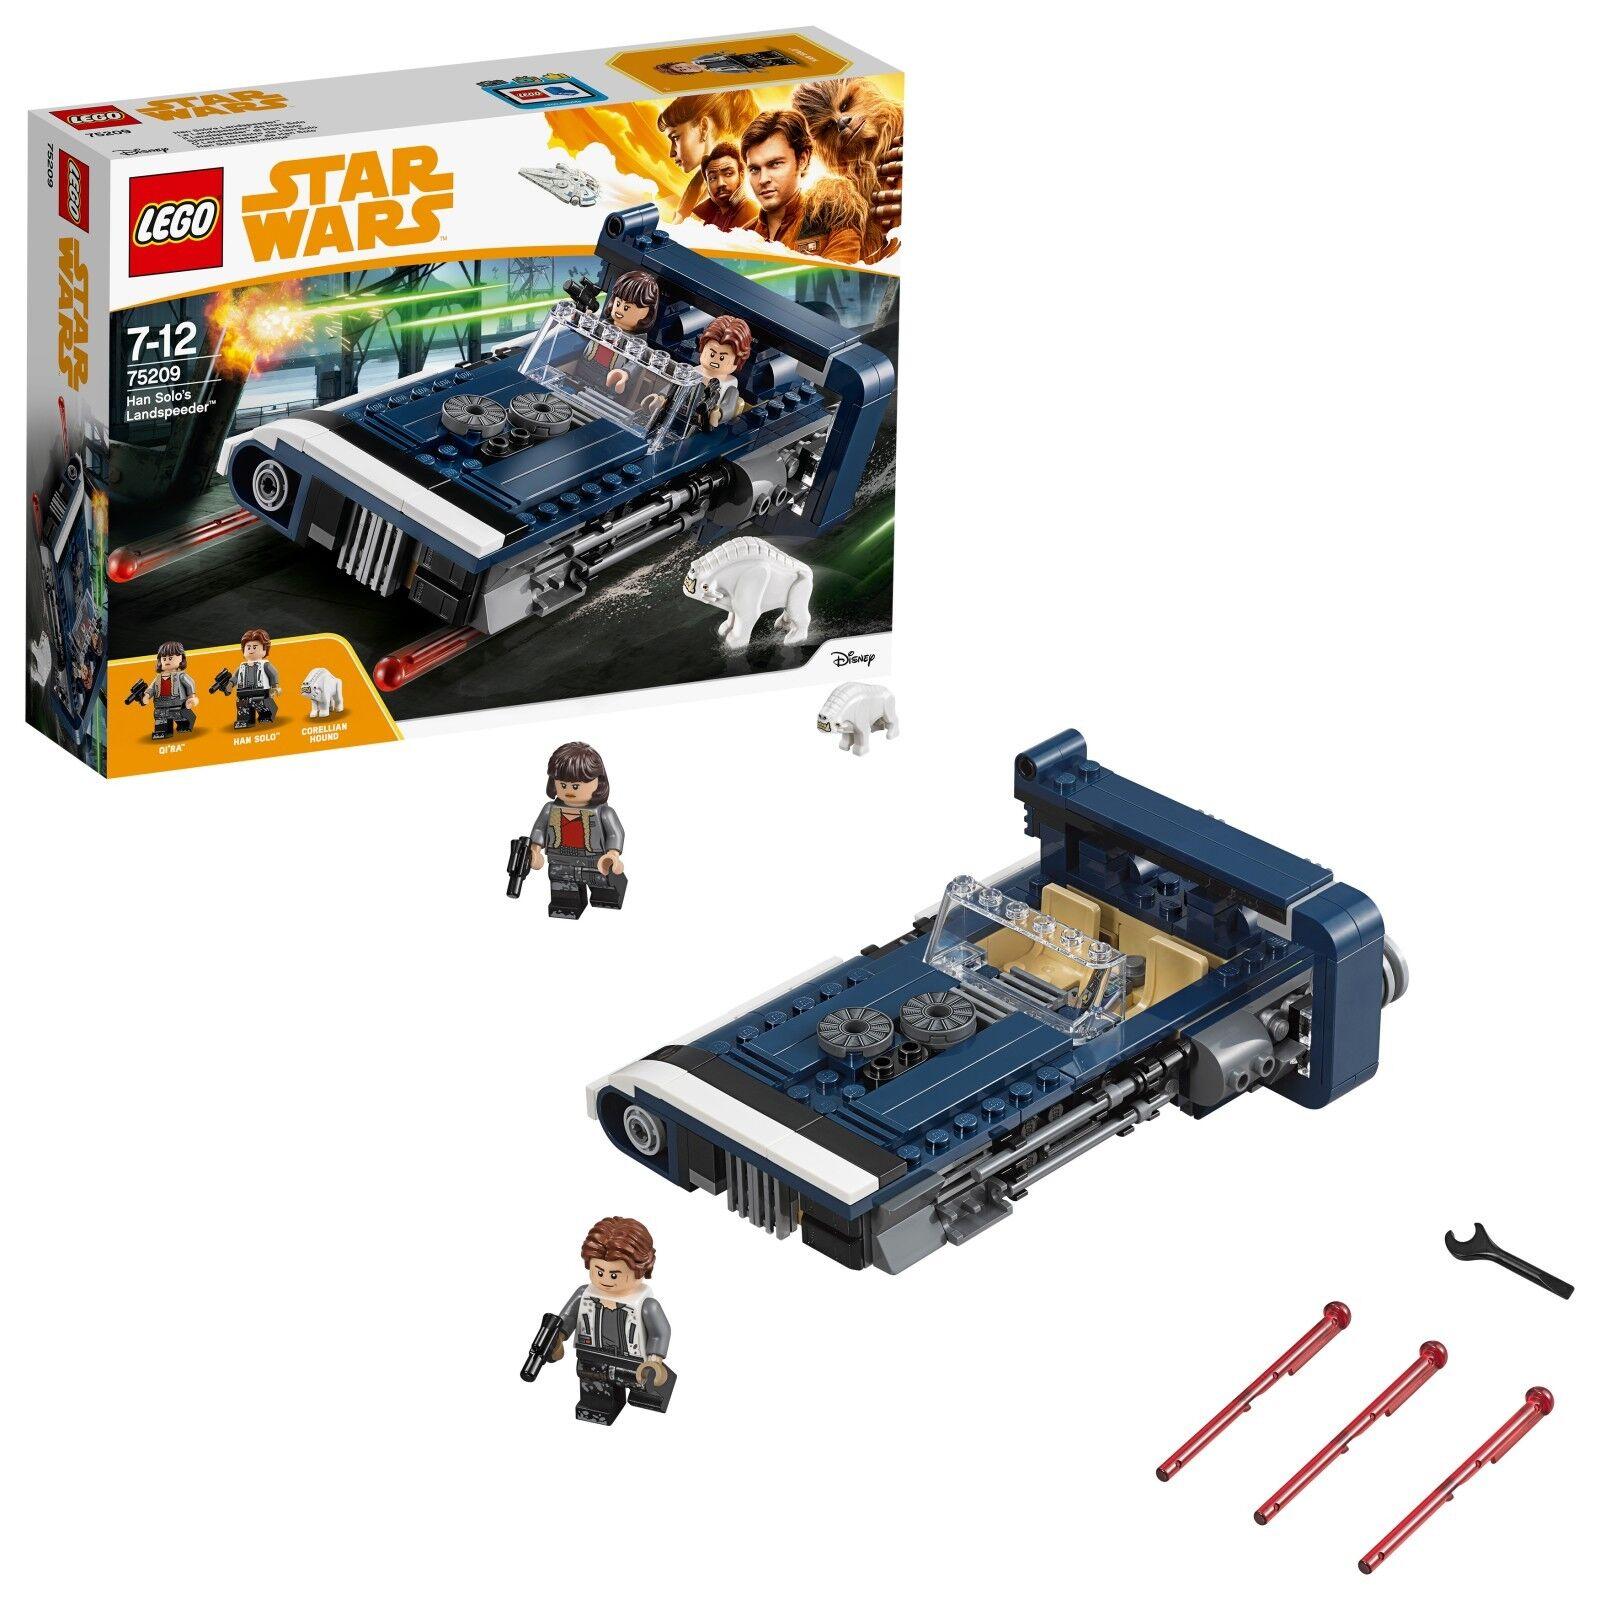 LEGO ® Star Wars ™ 75209 Han Solo's Landspeeder ™ NUOVO OVP NEW MISB NRFB